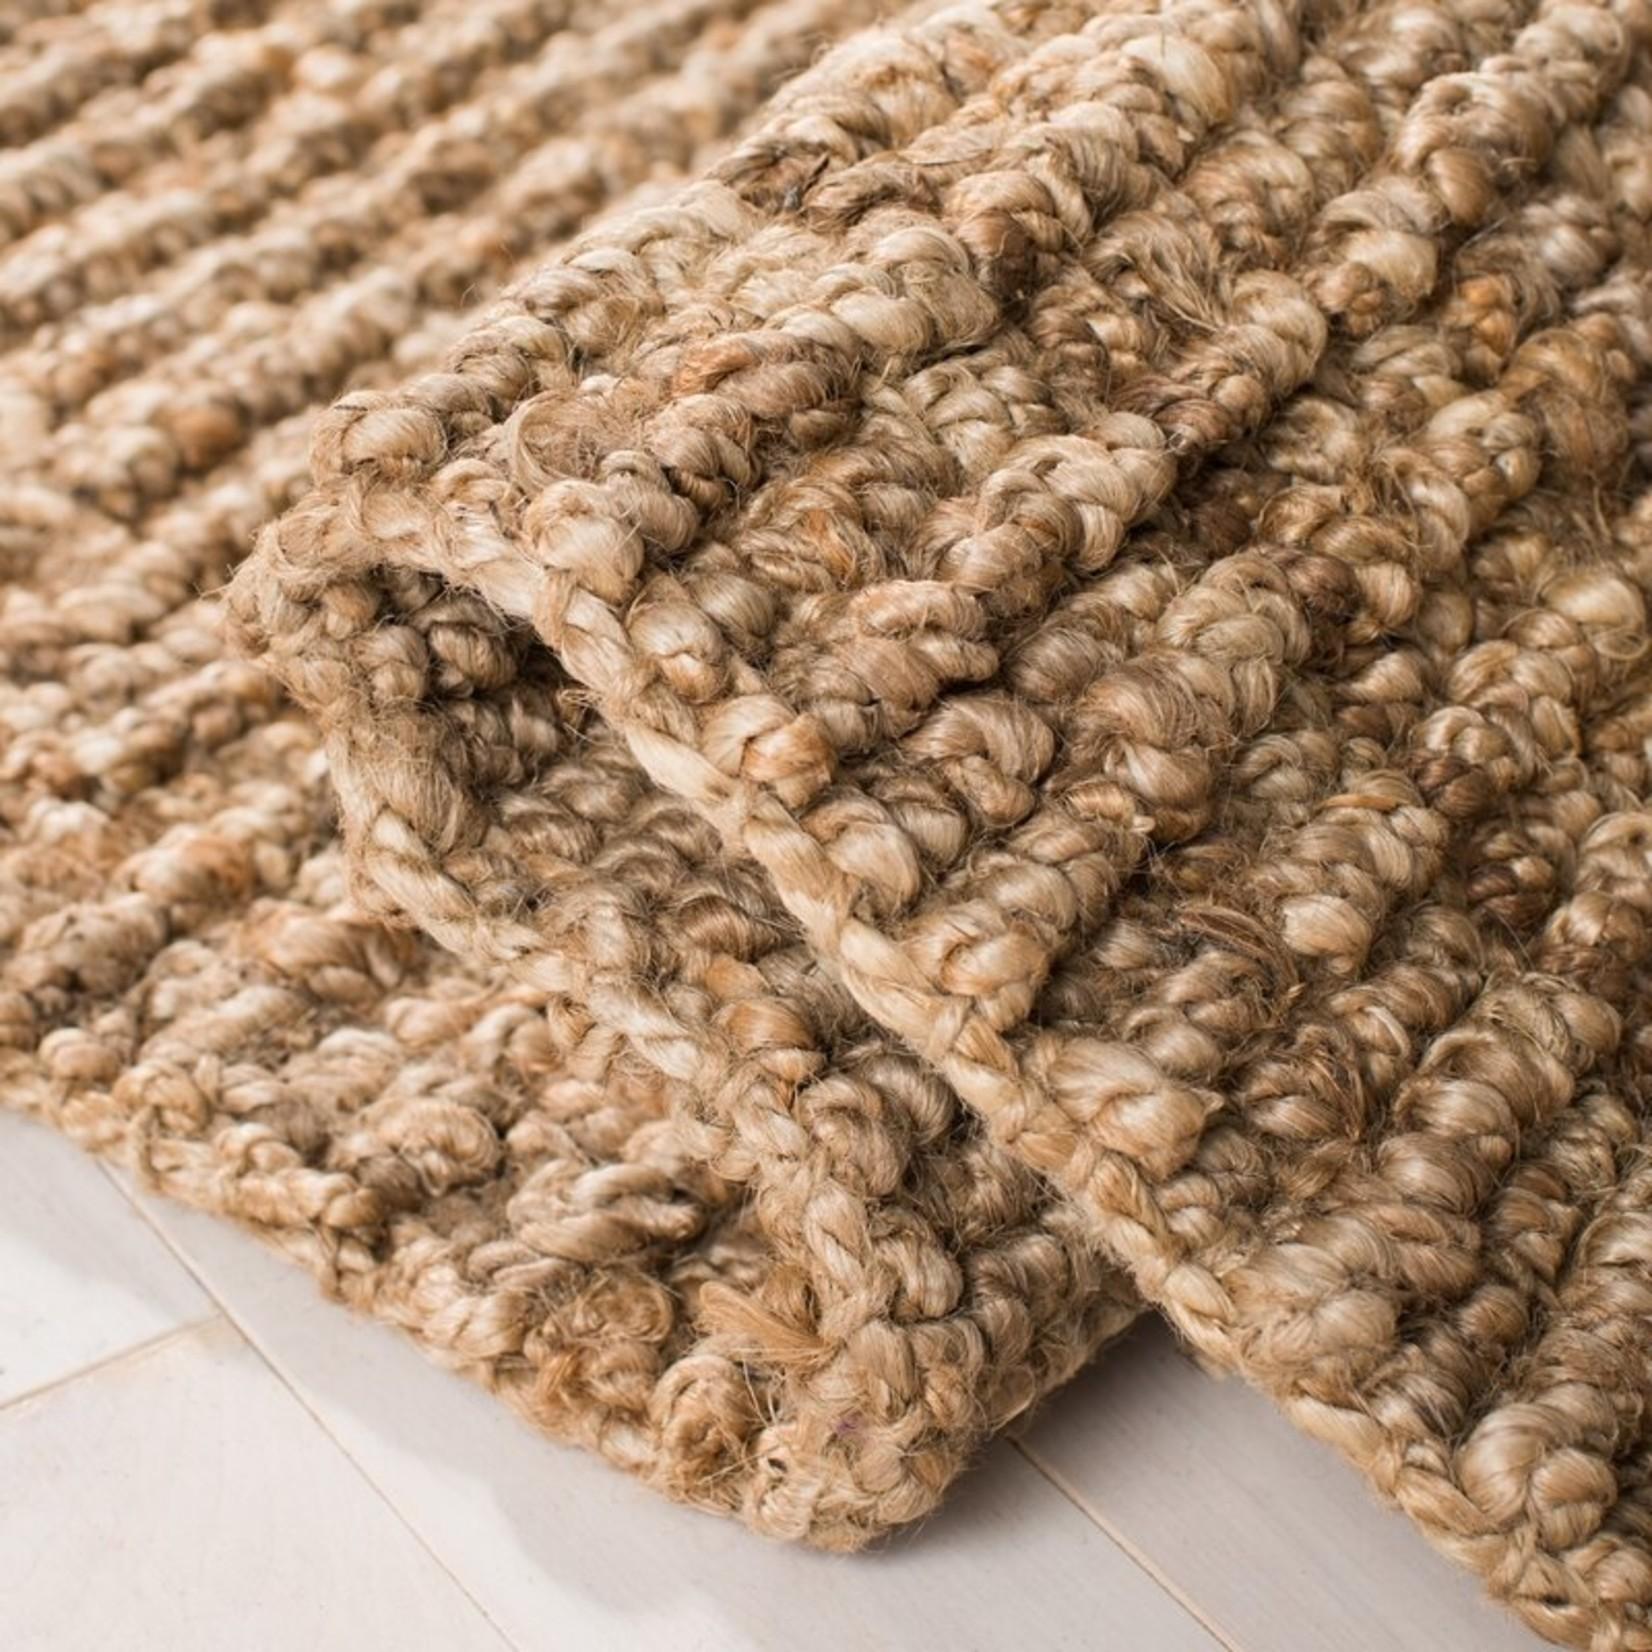 *2'6 x 12 - Grassmere Handmade Jute Natural Area Rug